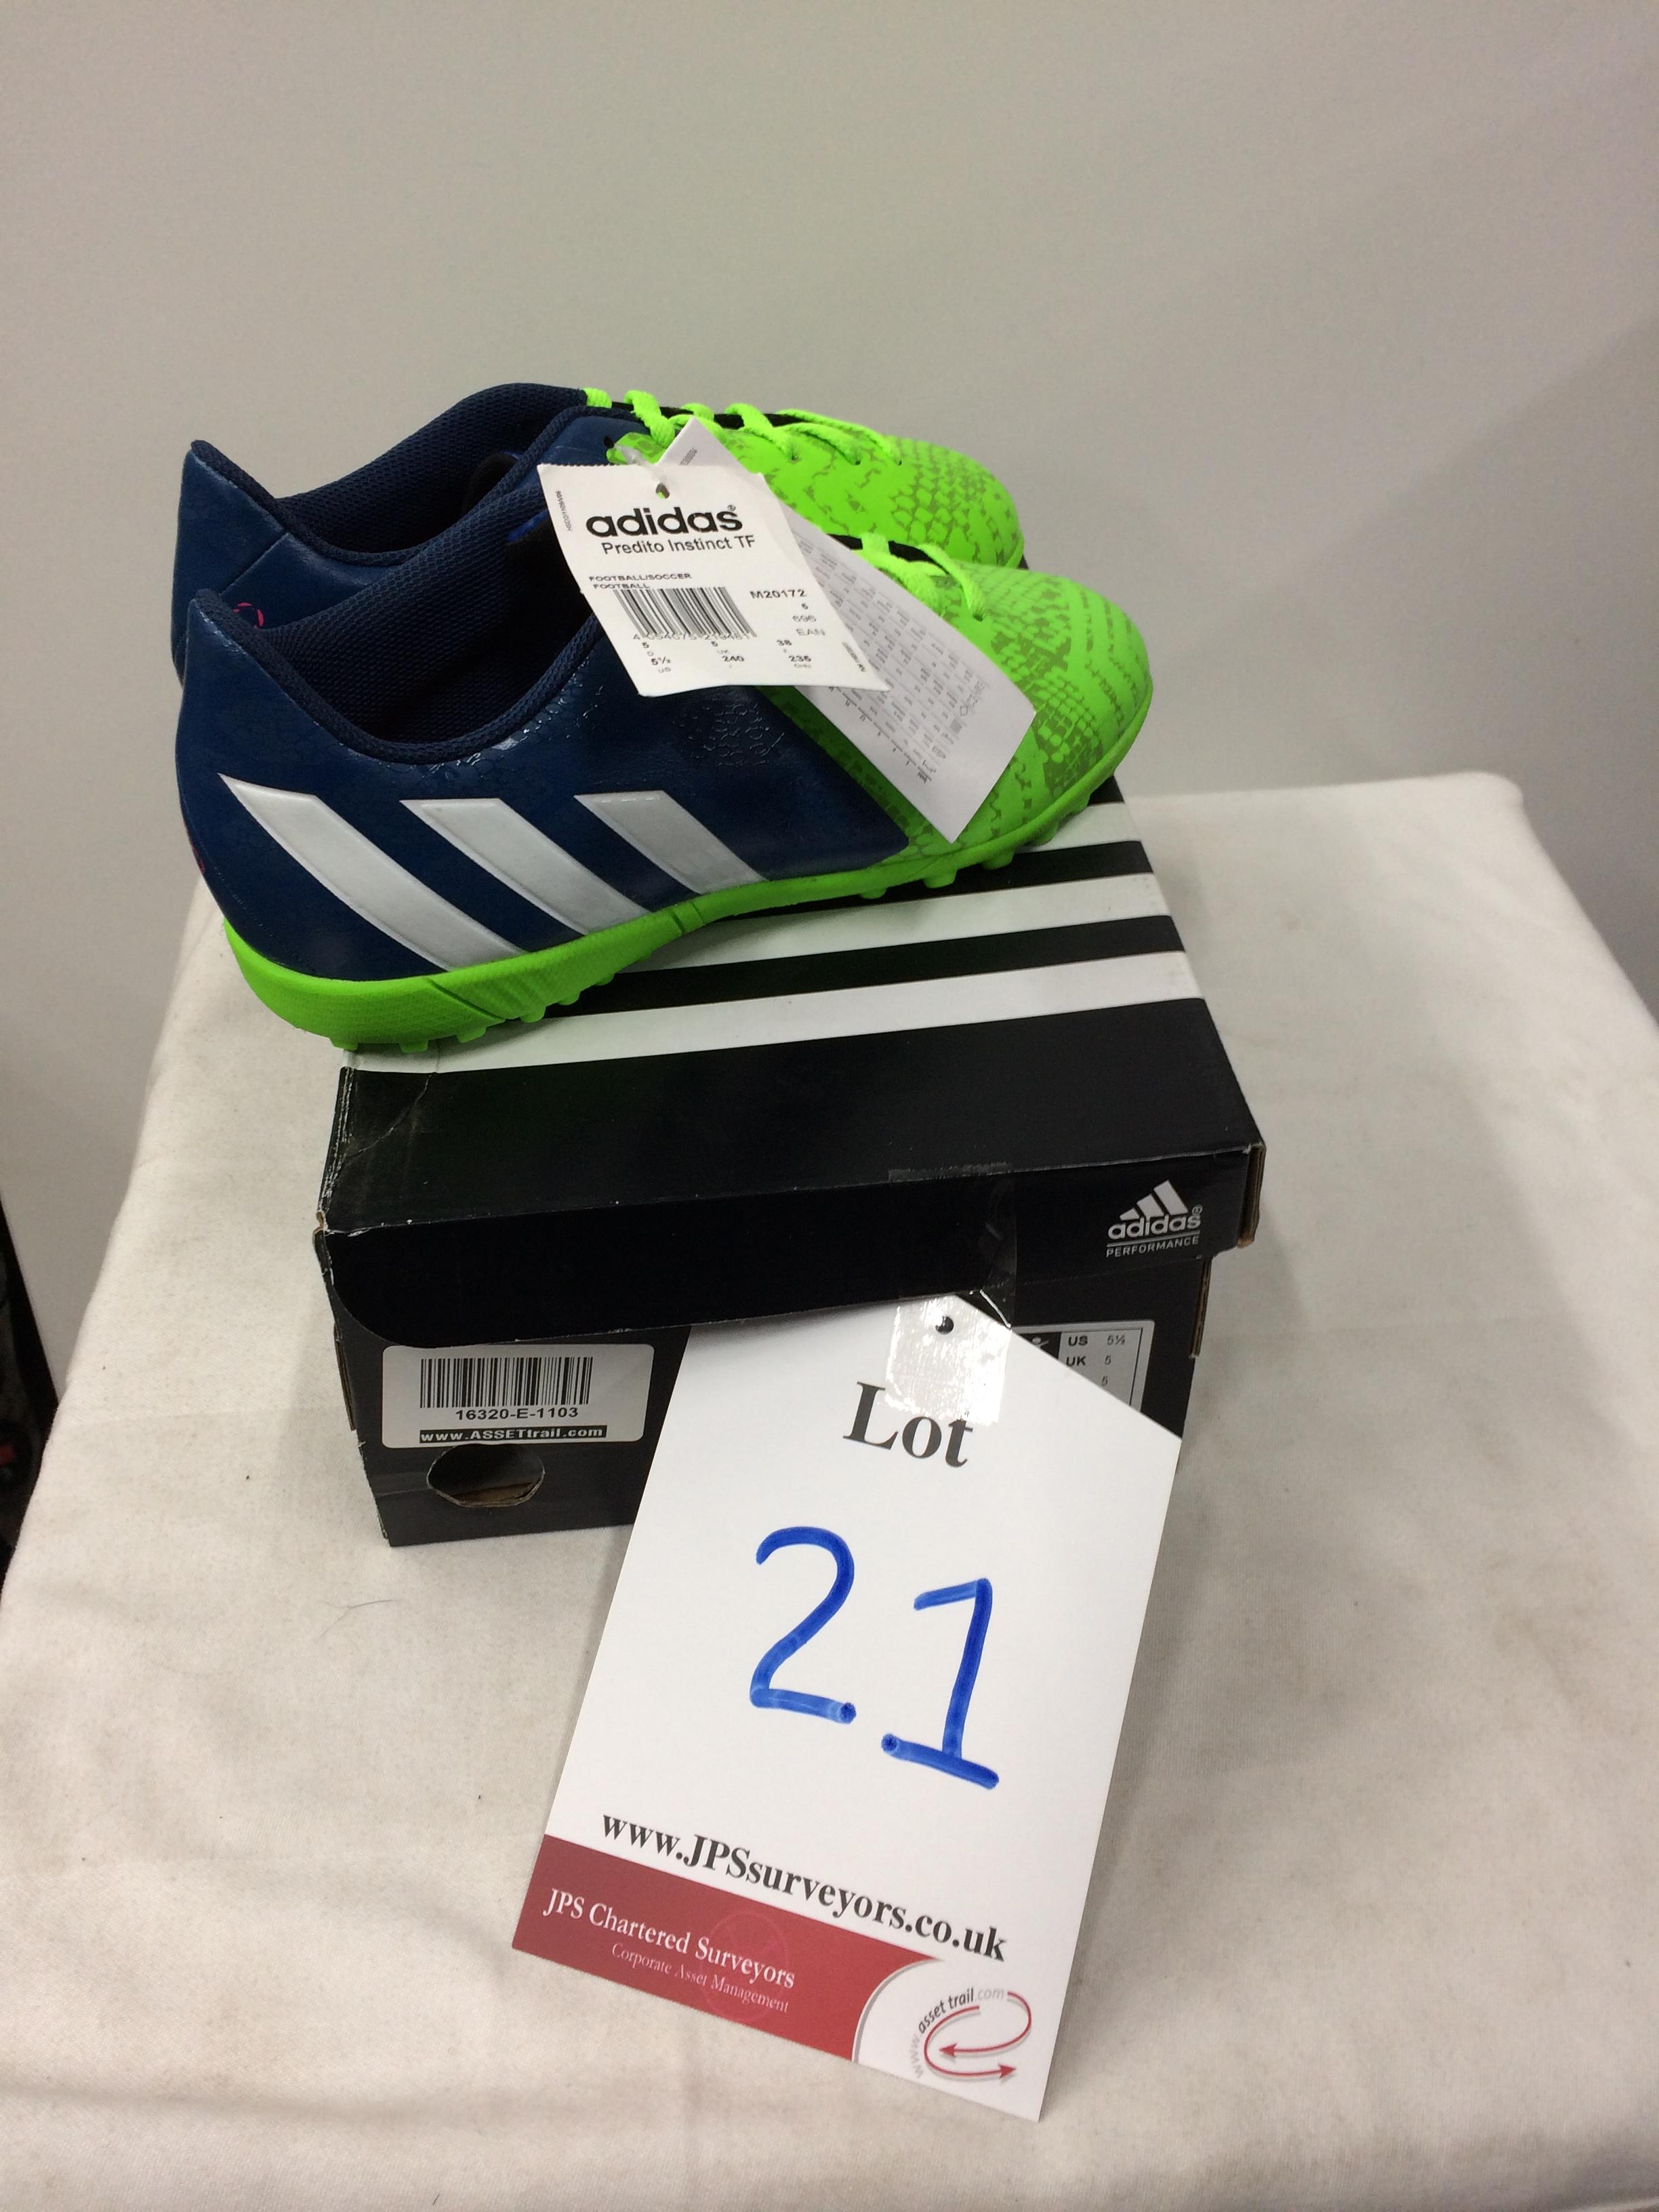 Adidas Co Id Catalogue Football Shoes